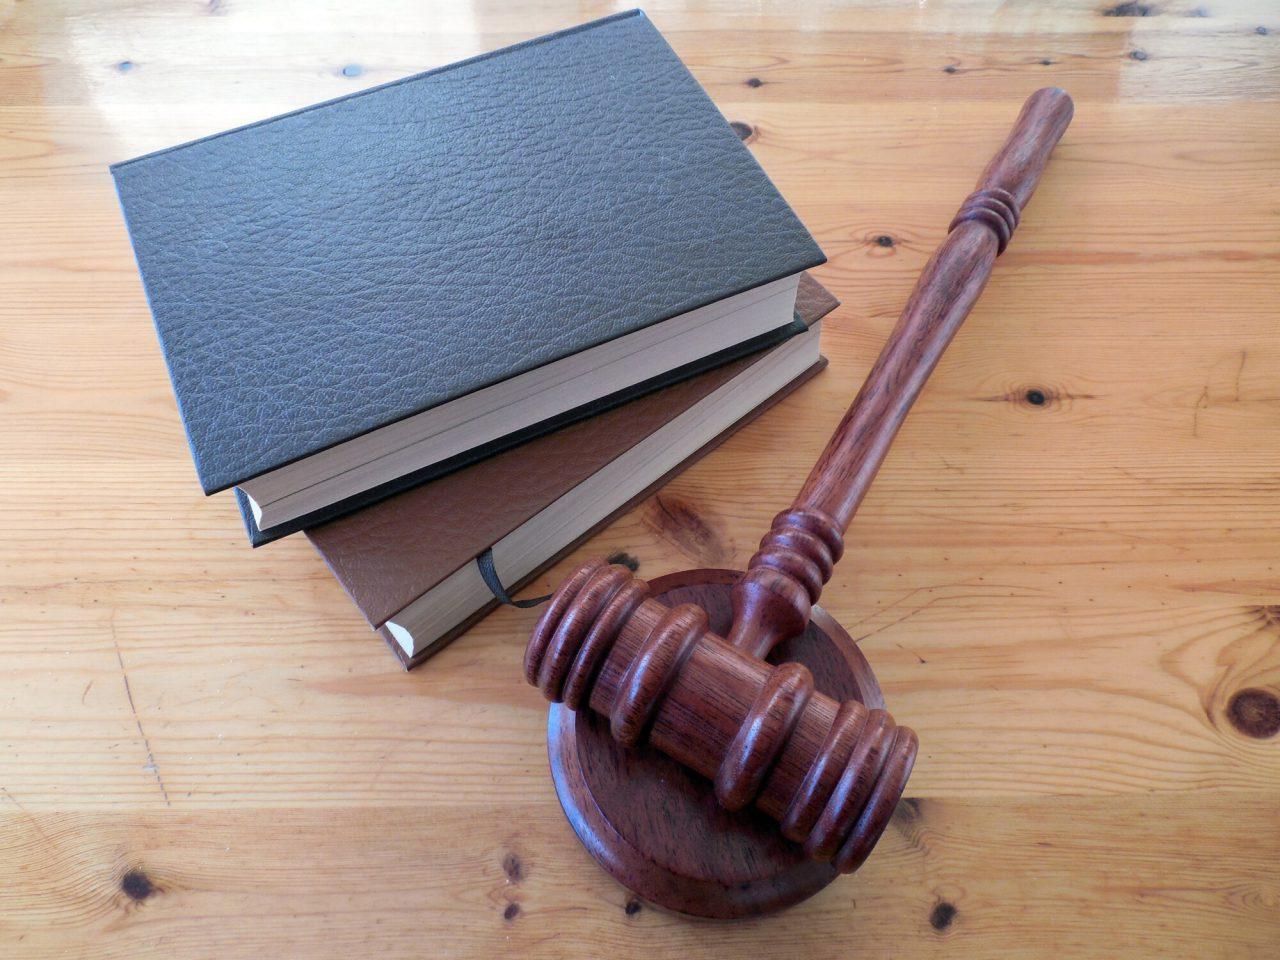 https://cdn.webupgrade.com/5f97605773dc770f19689897/wp-content/uploads/sites/21/2021/03/employment-attorney-1280x960.jpeg